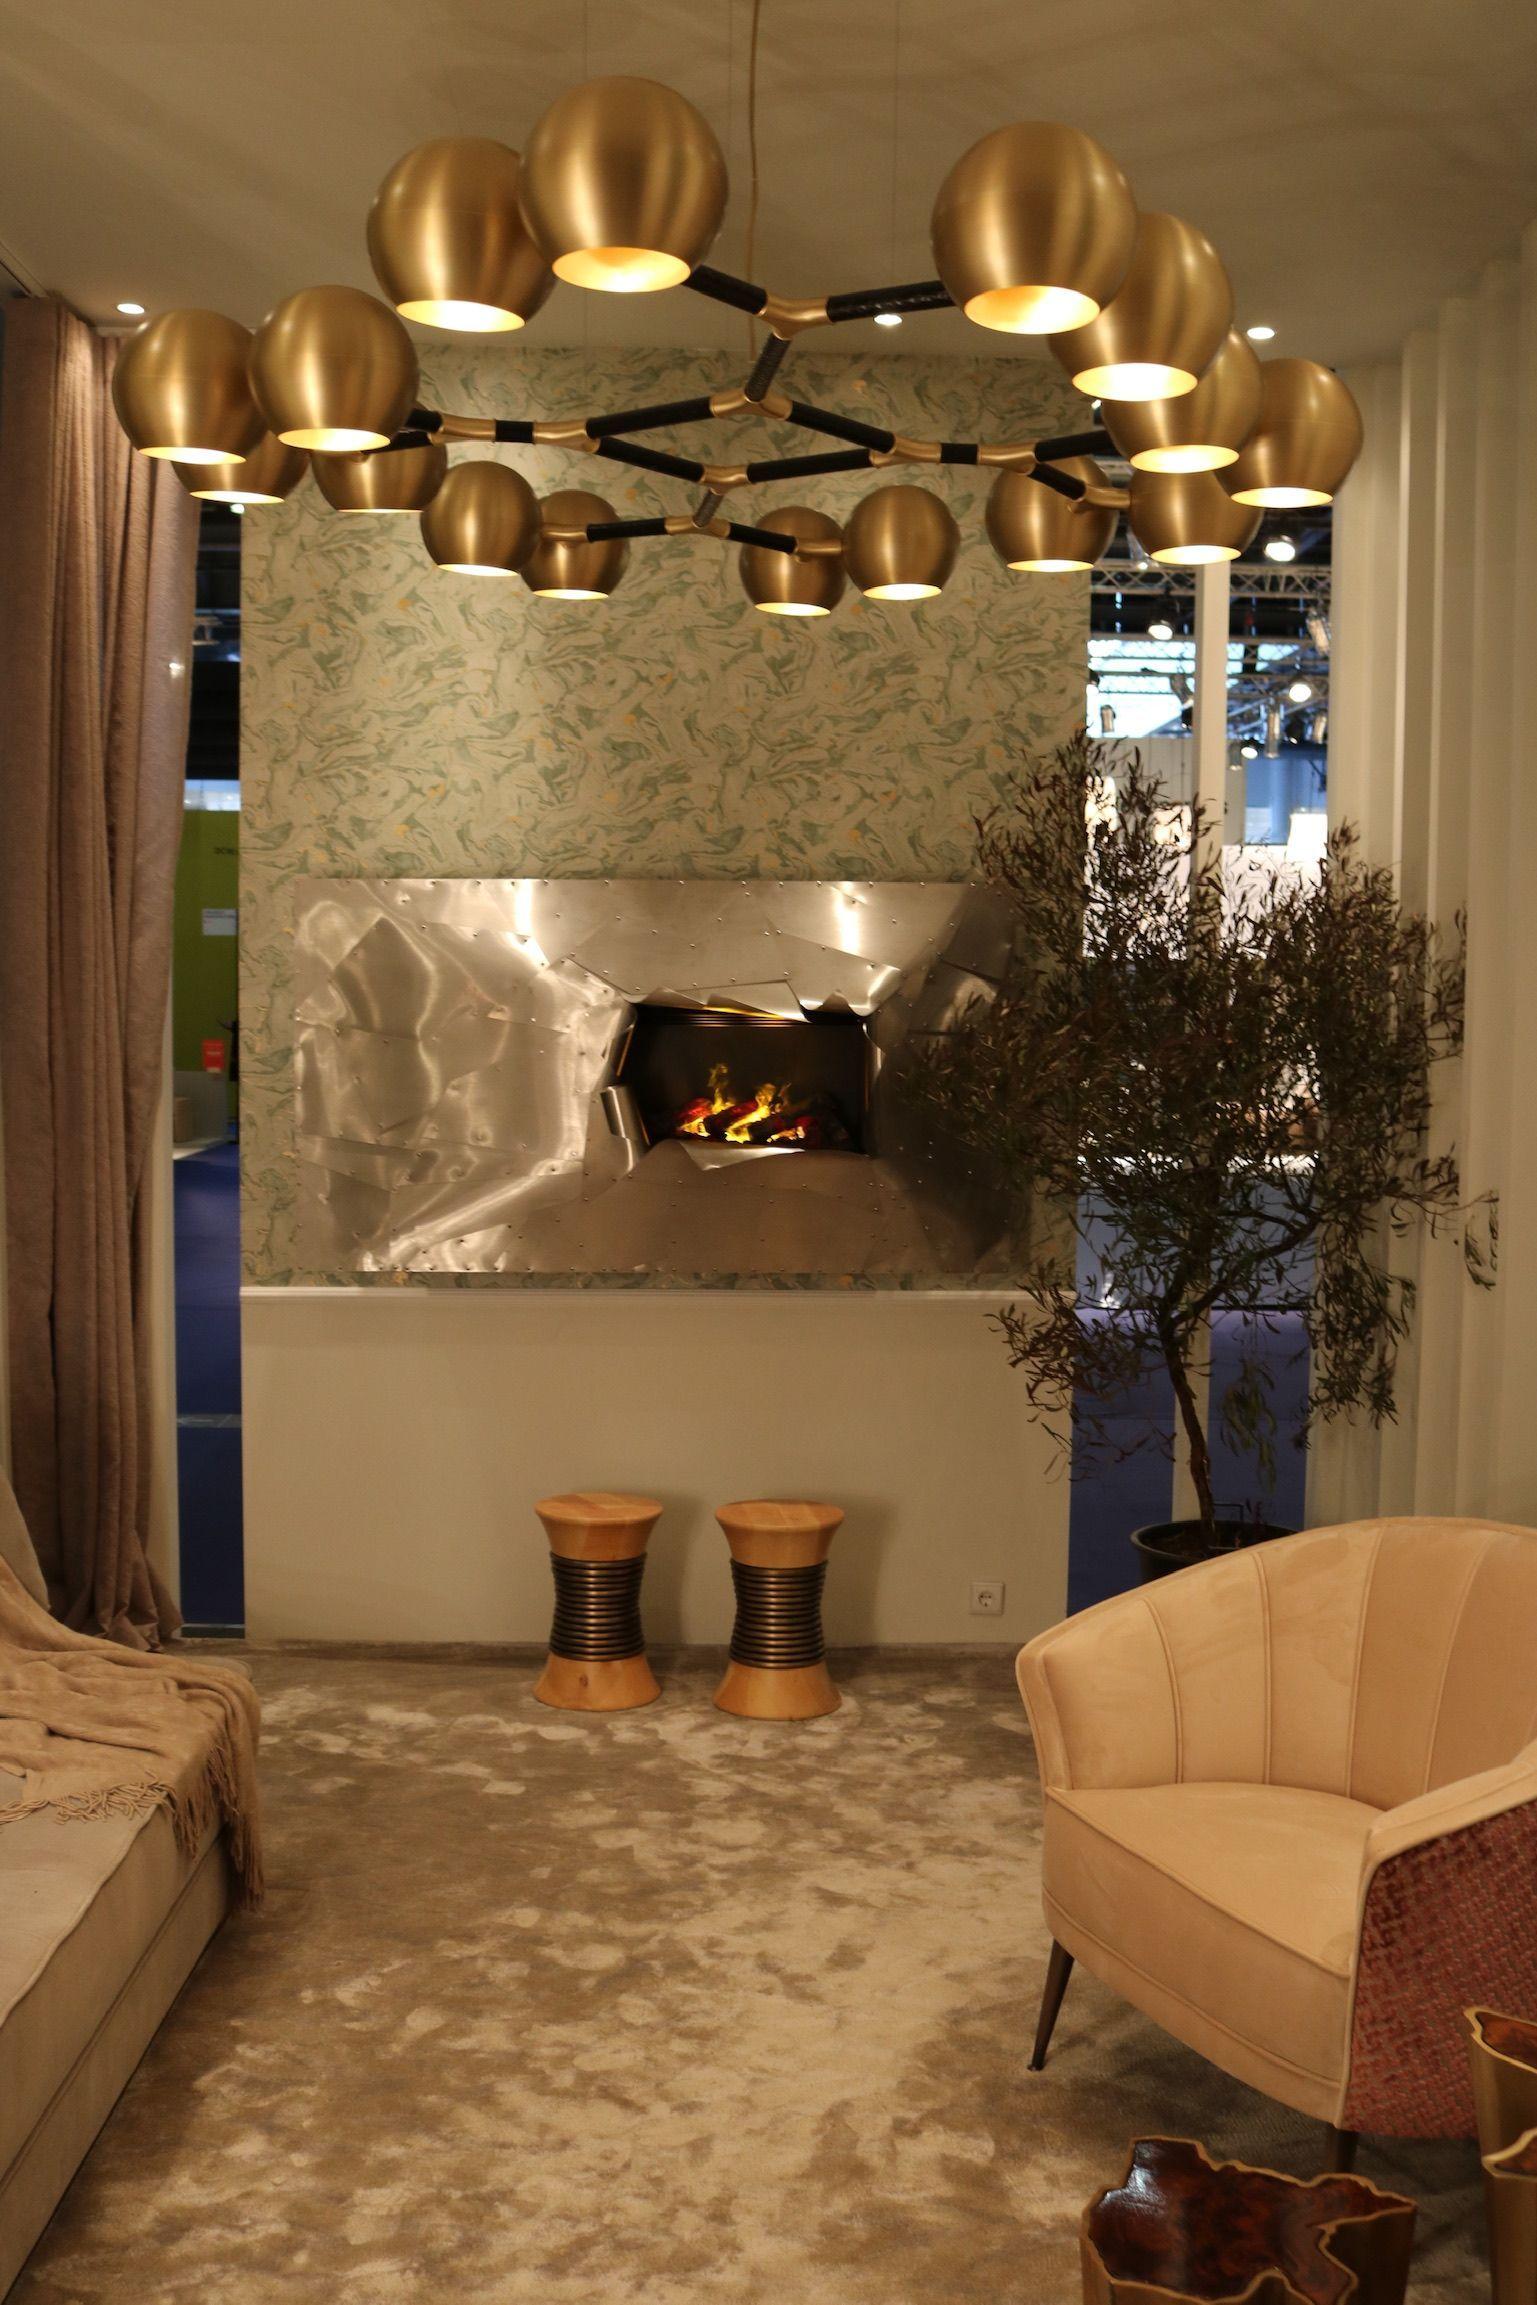 Top 5 Luxury Interior Design Trends For 2019 Luxury Interior Luxury Interior Design Interior Design Trends